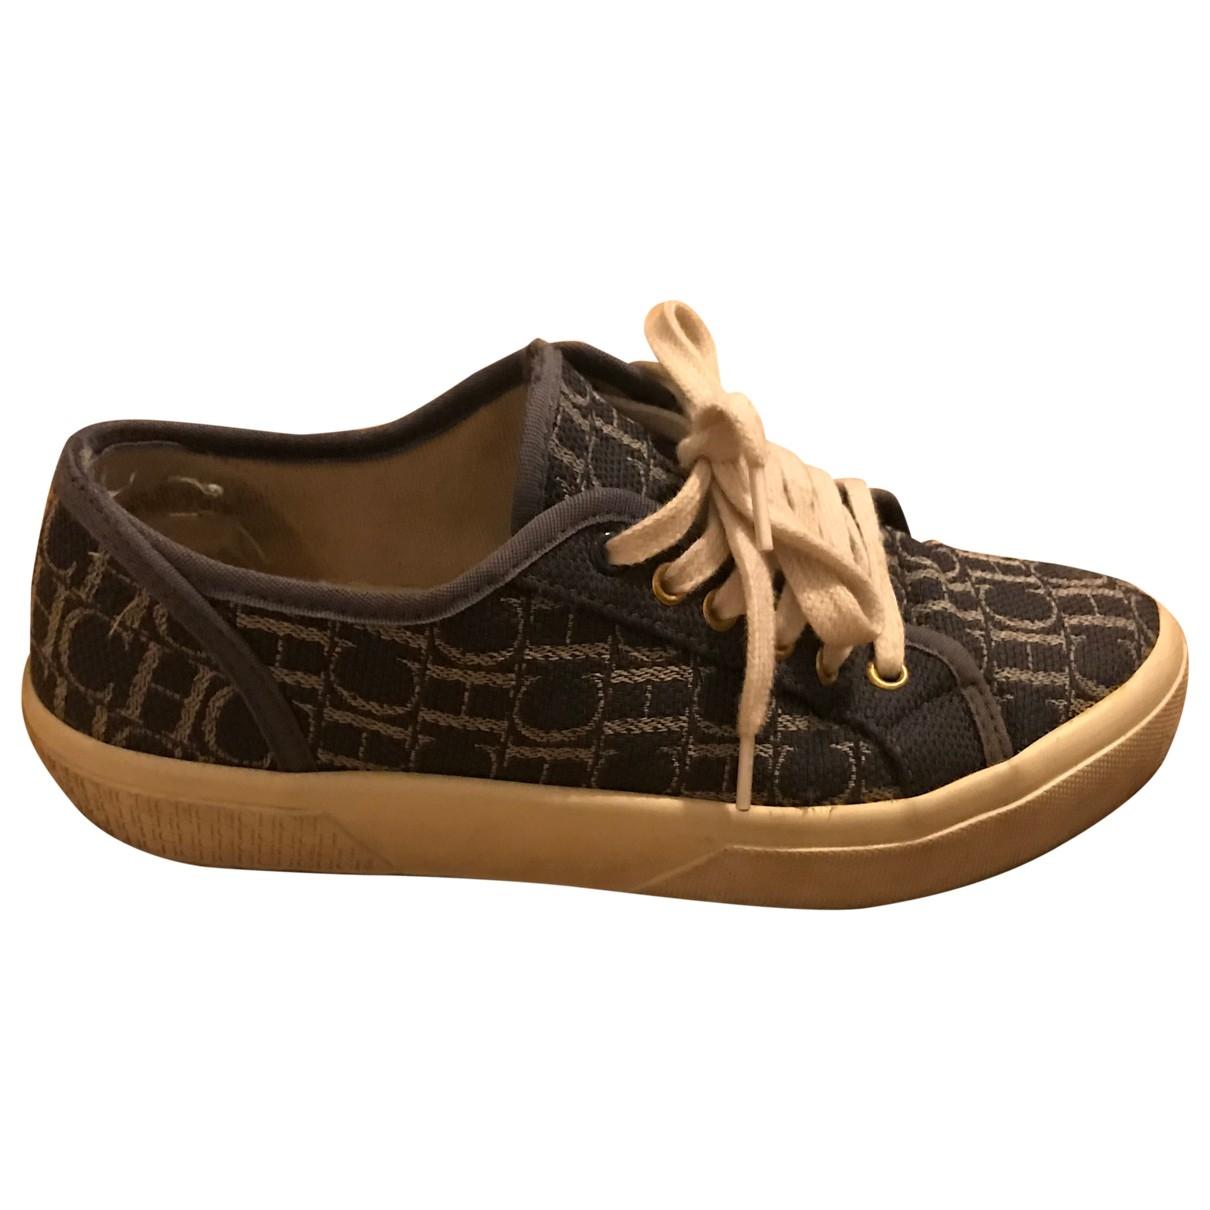 Carolina Herrera \N Sneakers in  Blau Leinen